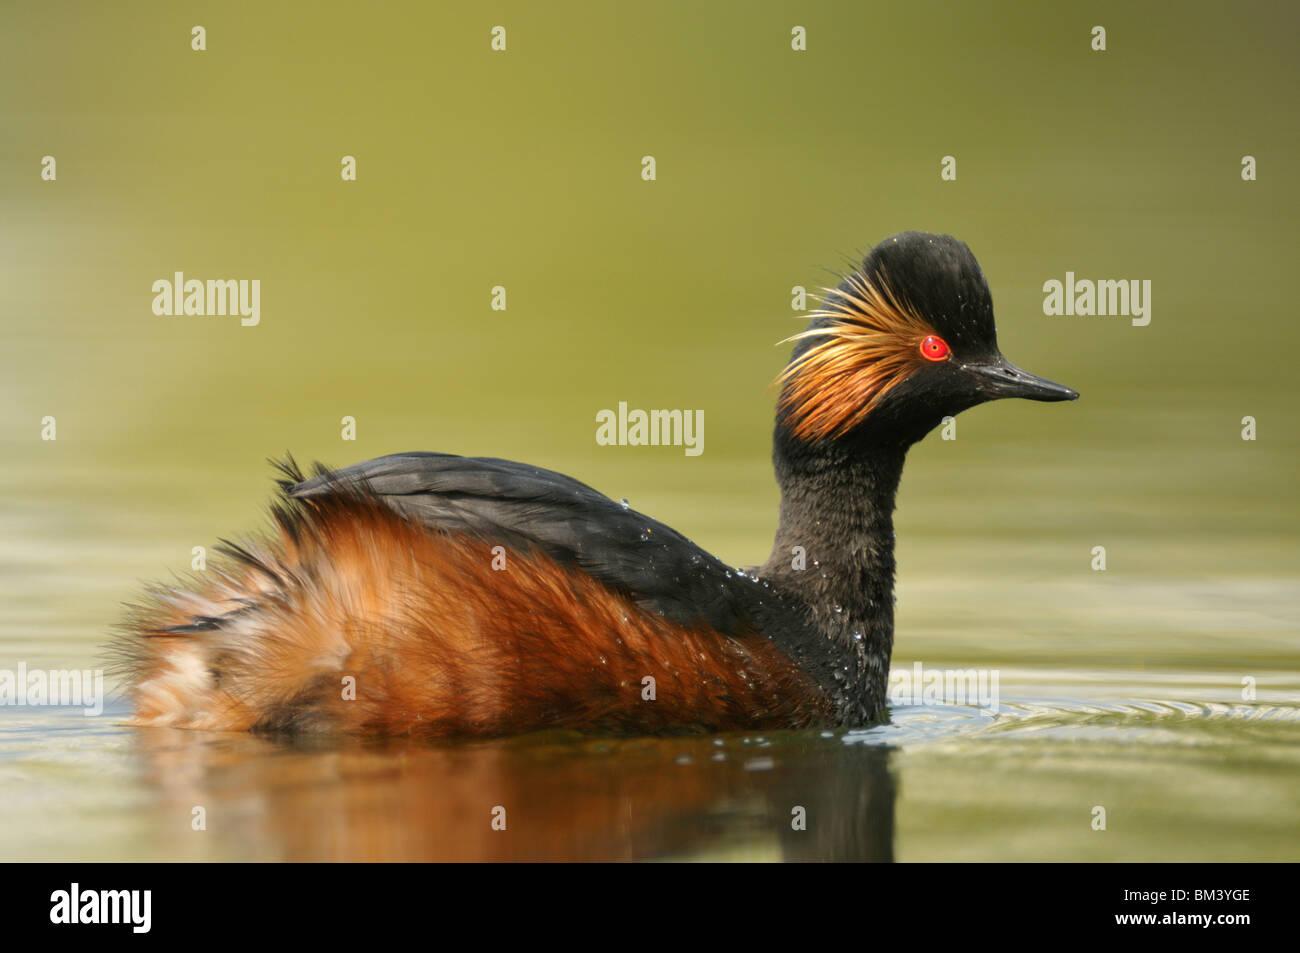 Black-necked Grebe (Podiceps nigricollis). Male in breeding plumage on a calm lake. - Stock Image